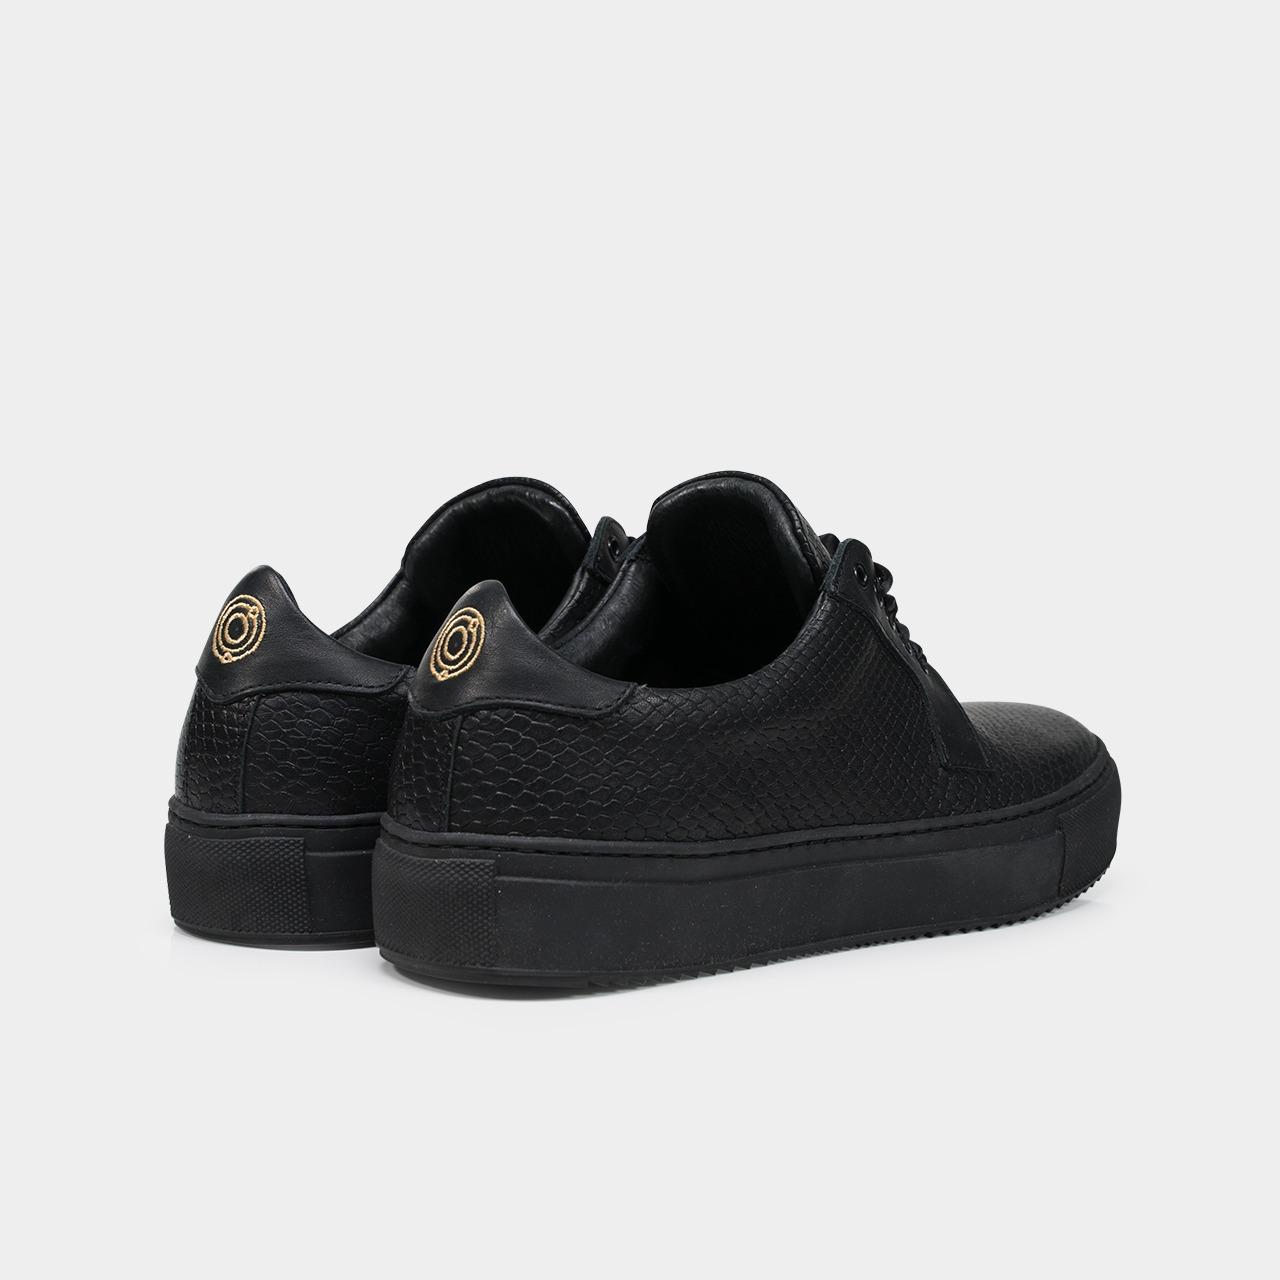 Sneaker delta sport - full black - Subtle num 2